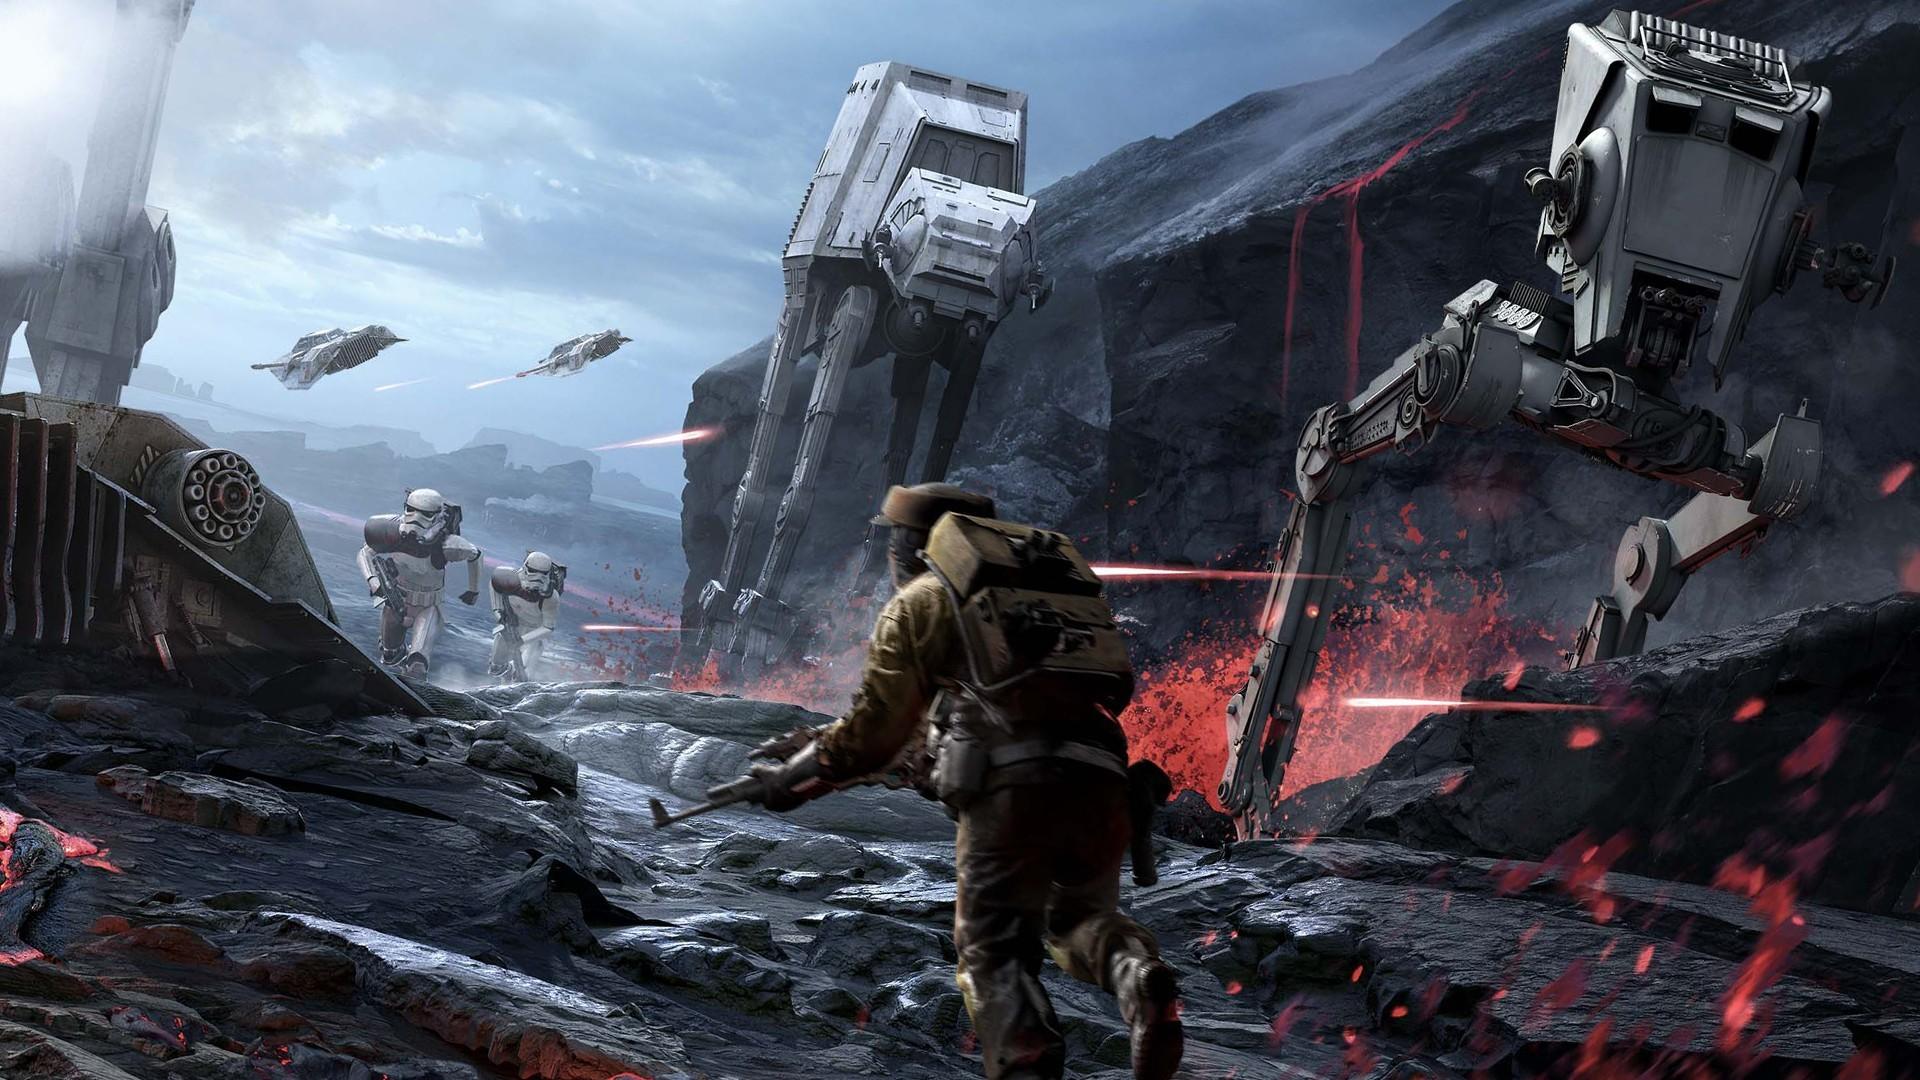 General 1920x1080 Star Wars video games science fiction Star Wars: Battlefront video game art AT-AT AT-ST battle